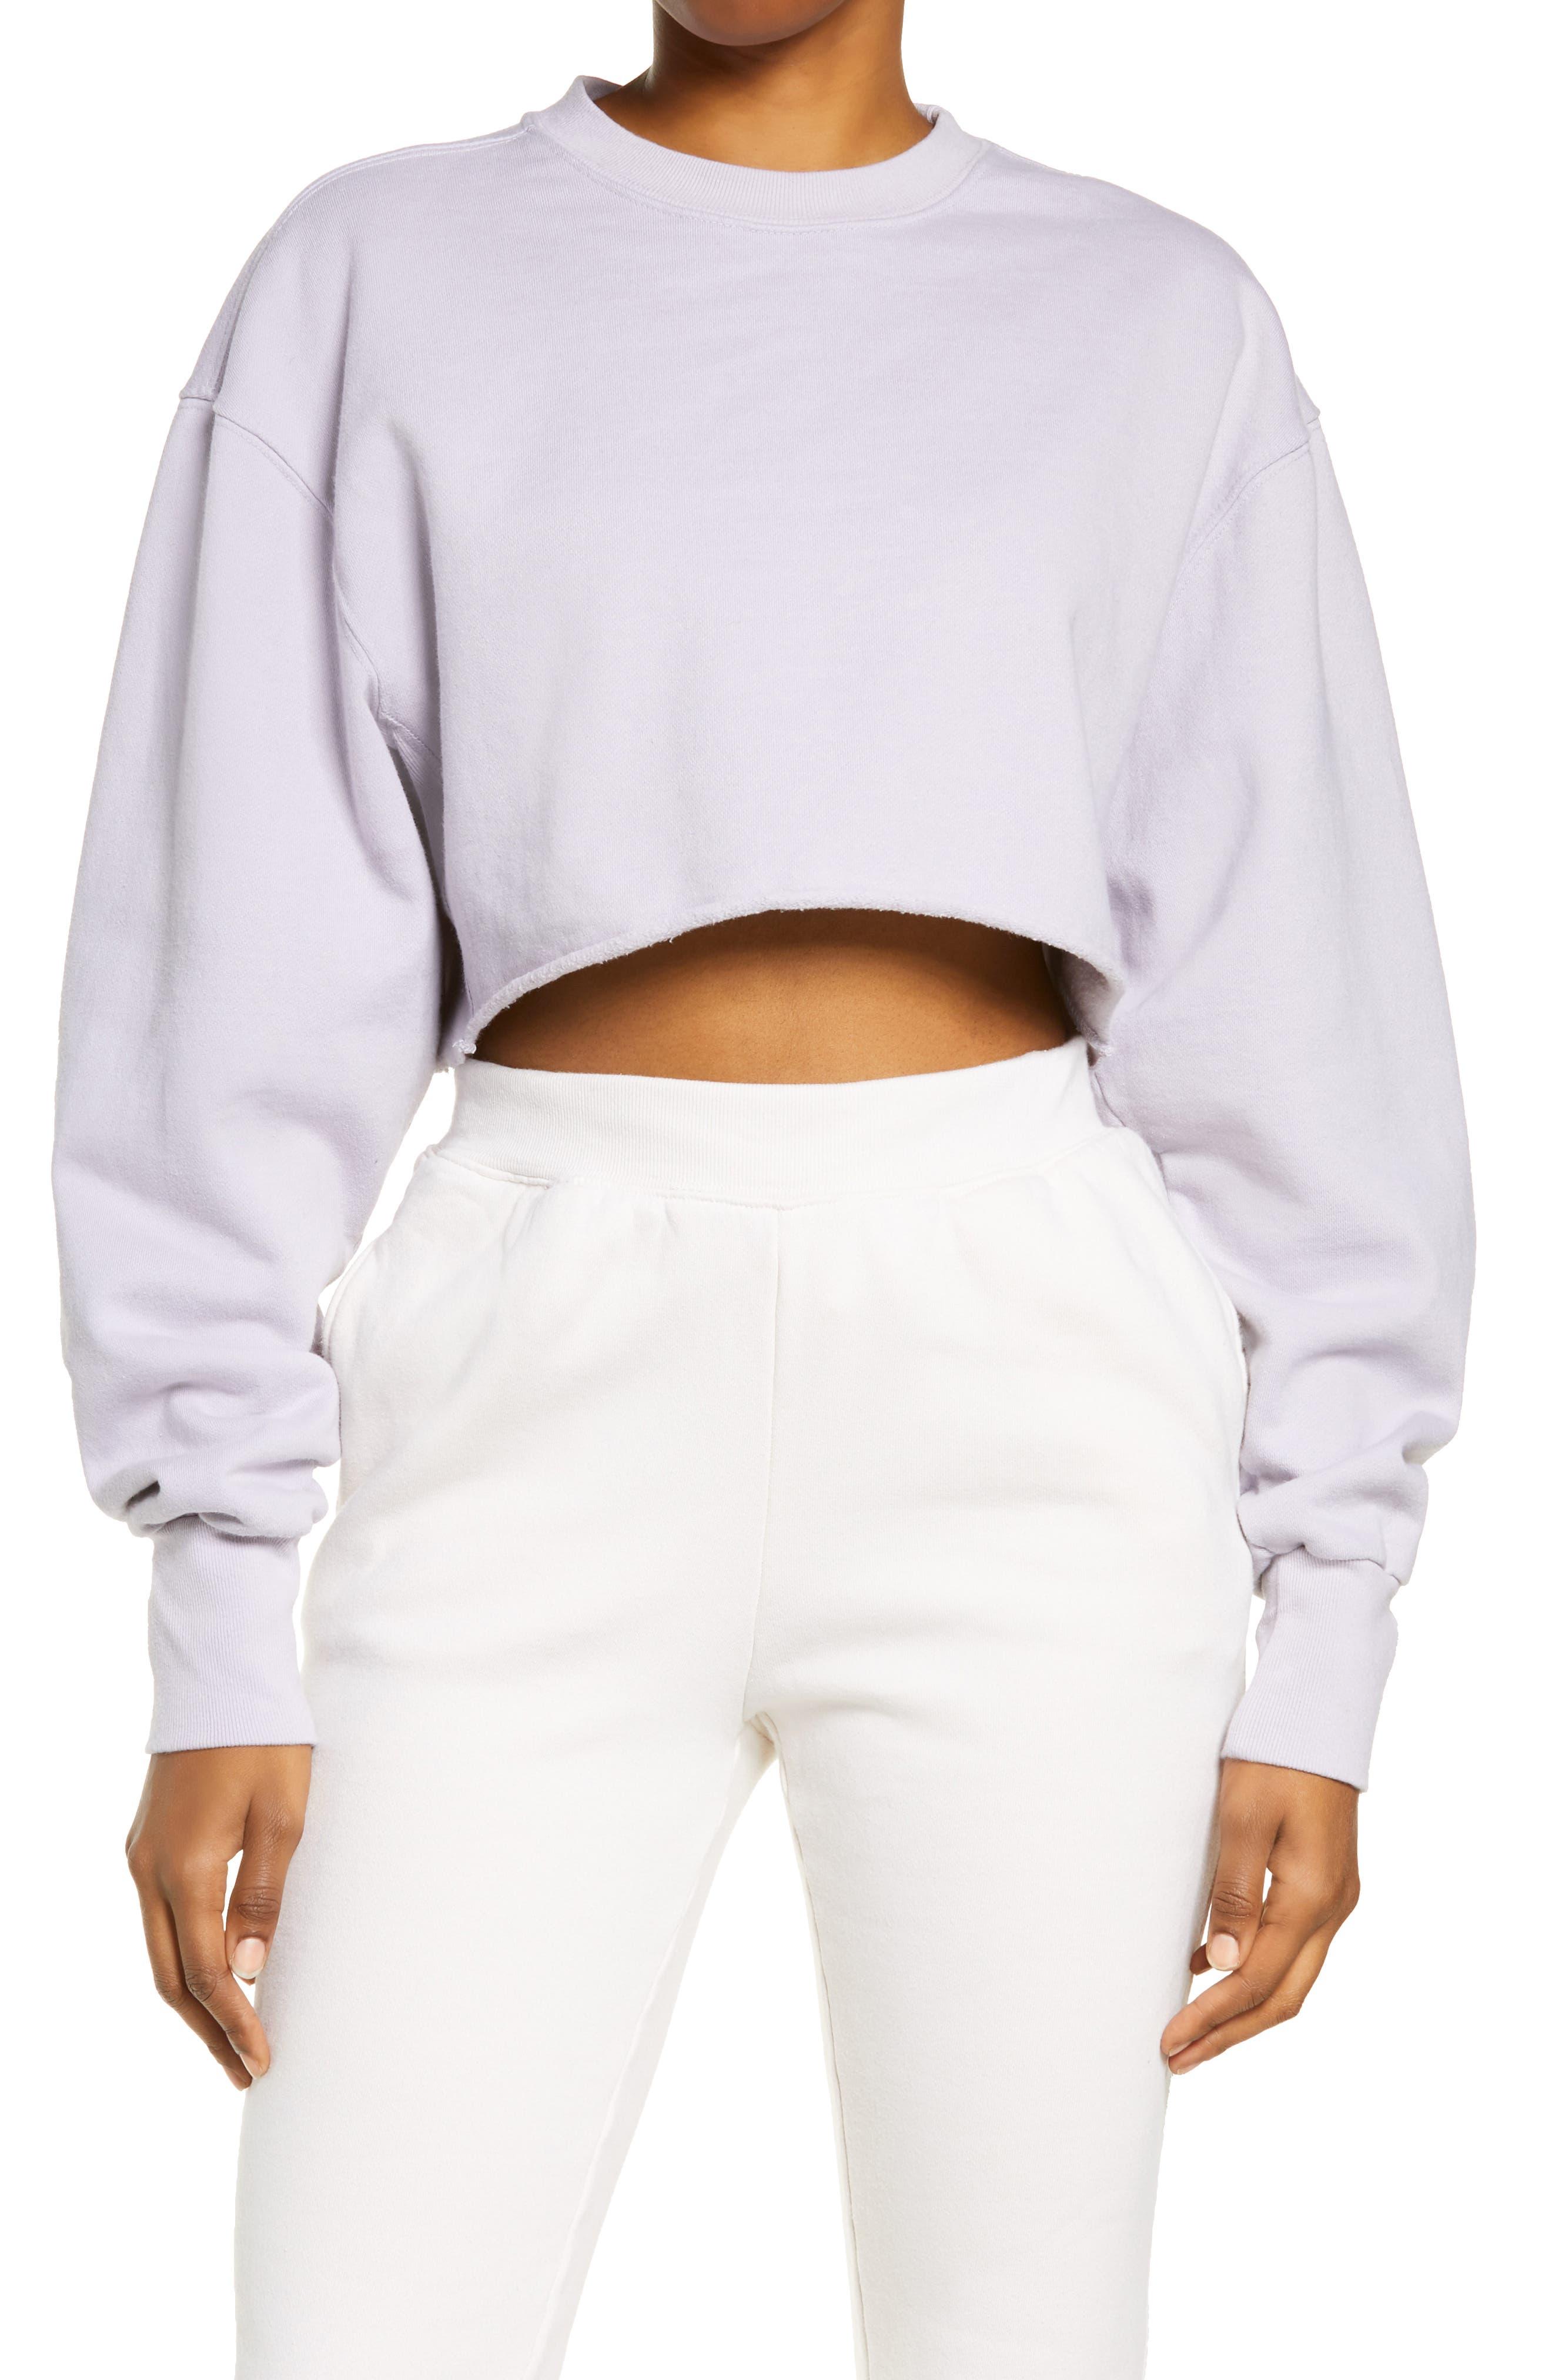 Jug/&Po Womens Color Block Crewneck Tie Dye Sweatshirt Long Sleeve Casual Loose Fit Pullover Sweatshirt Tops